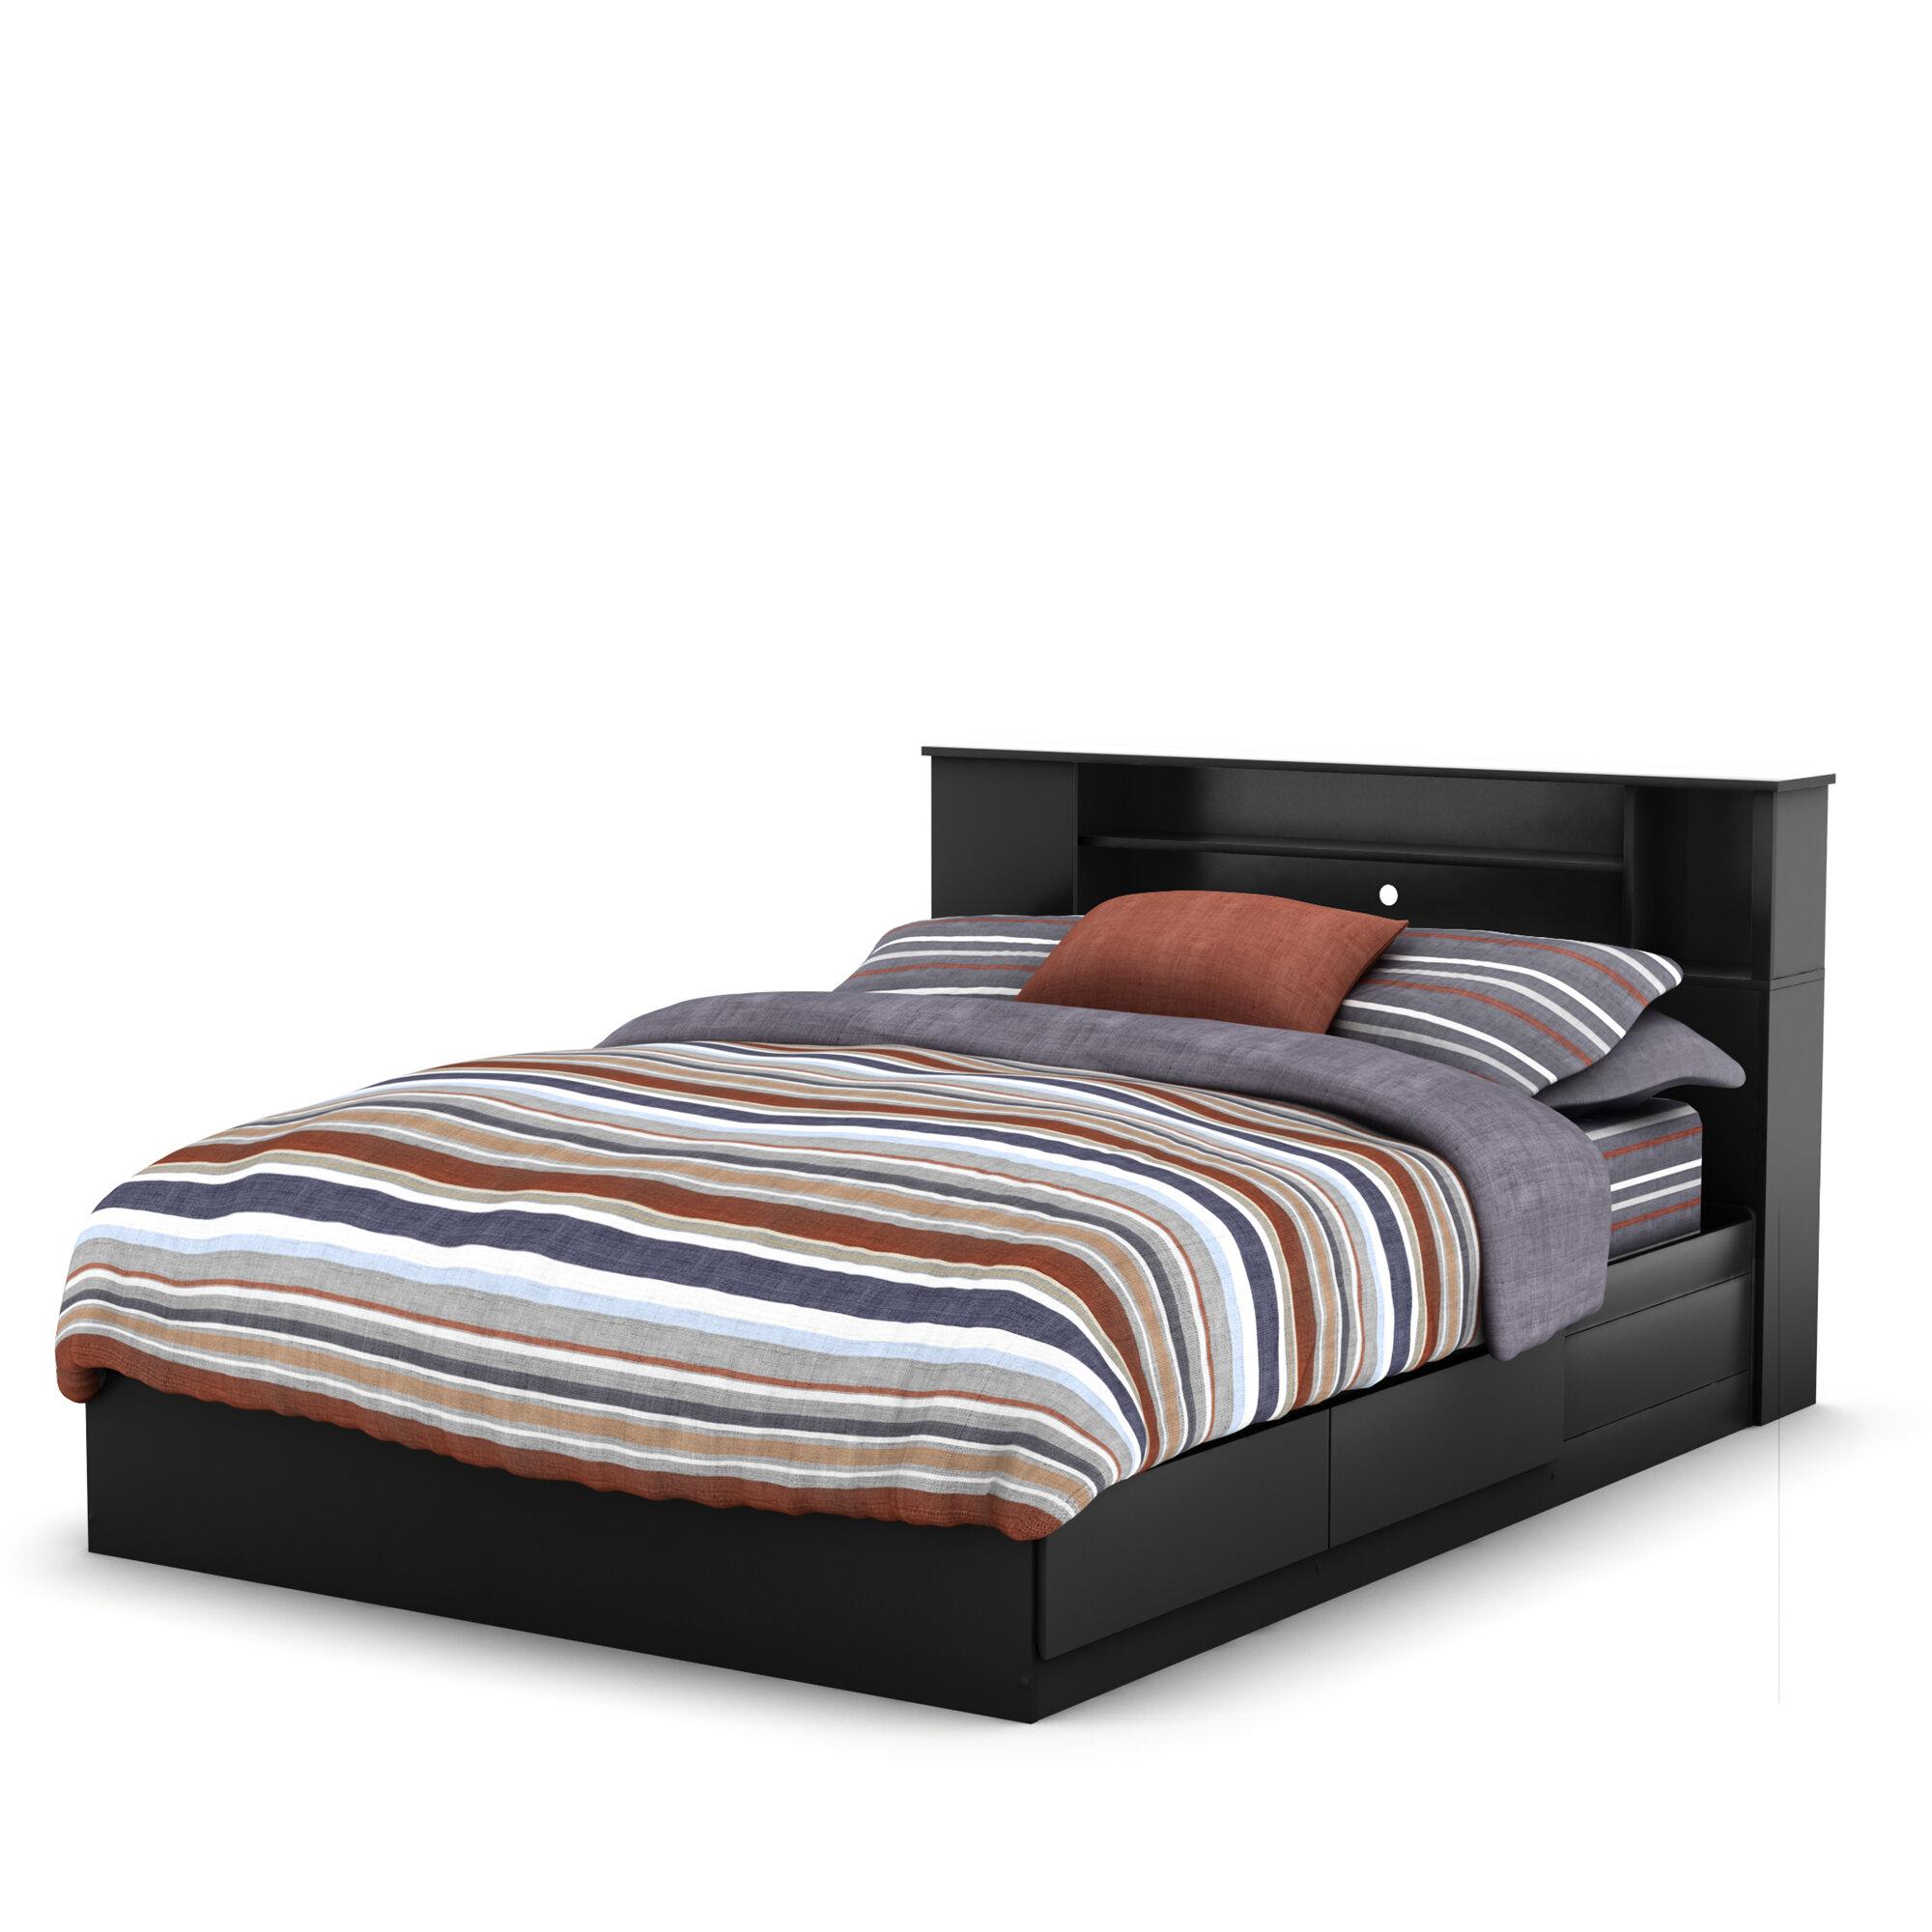 Mates Queen Storage Platform Bed